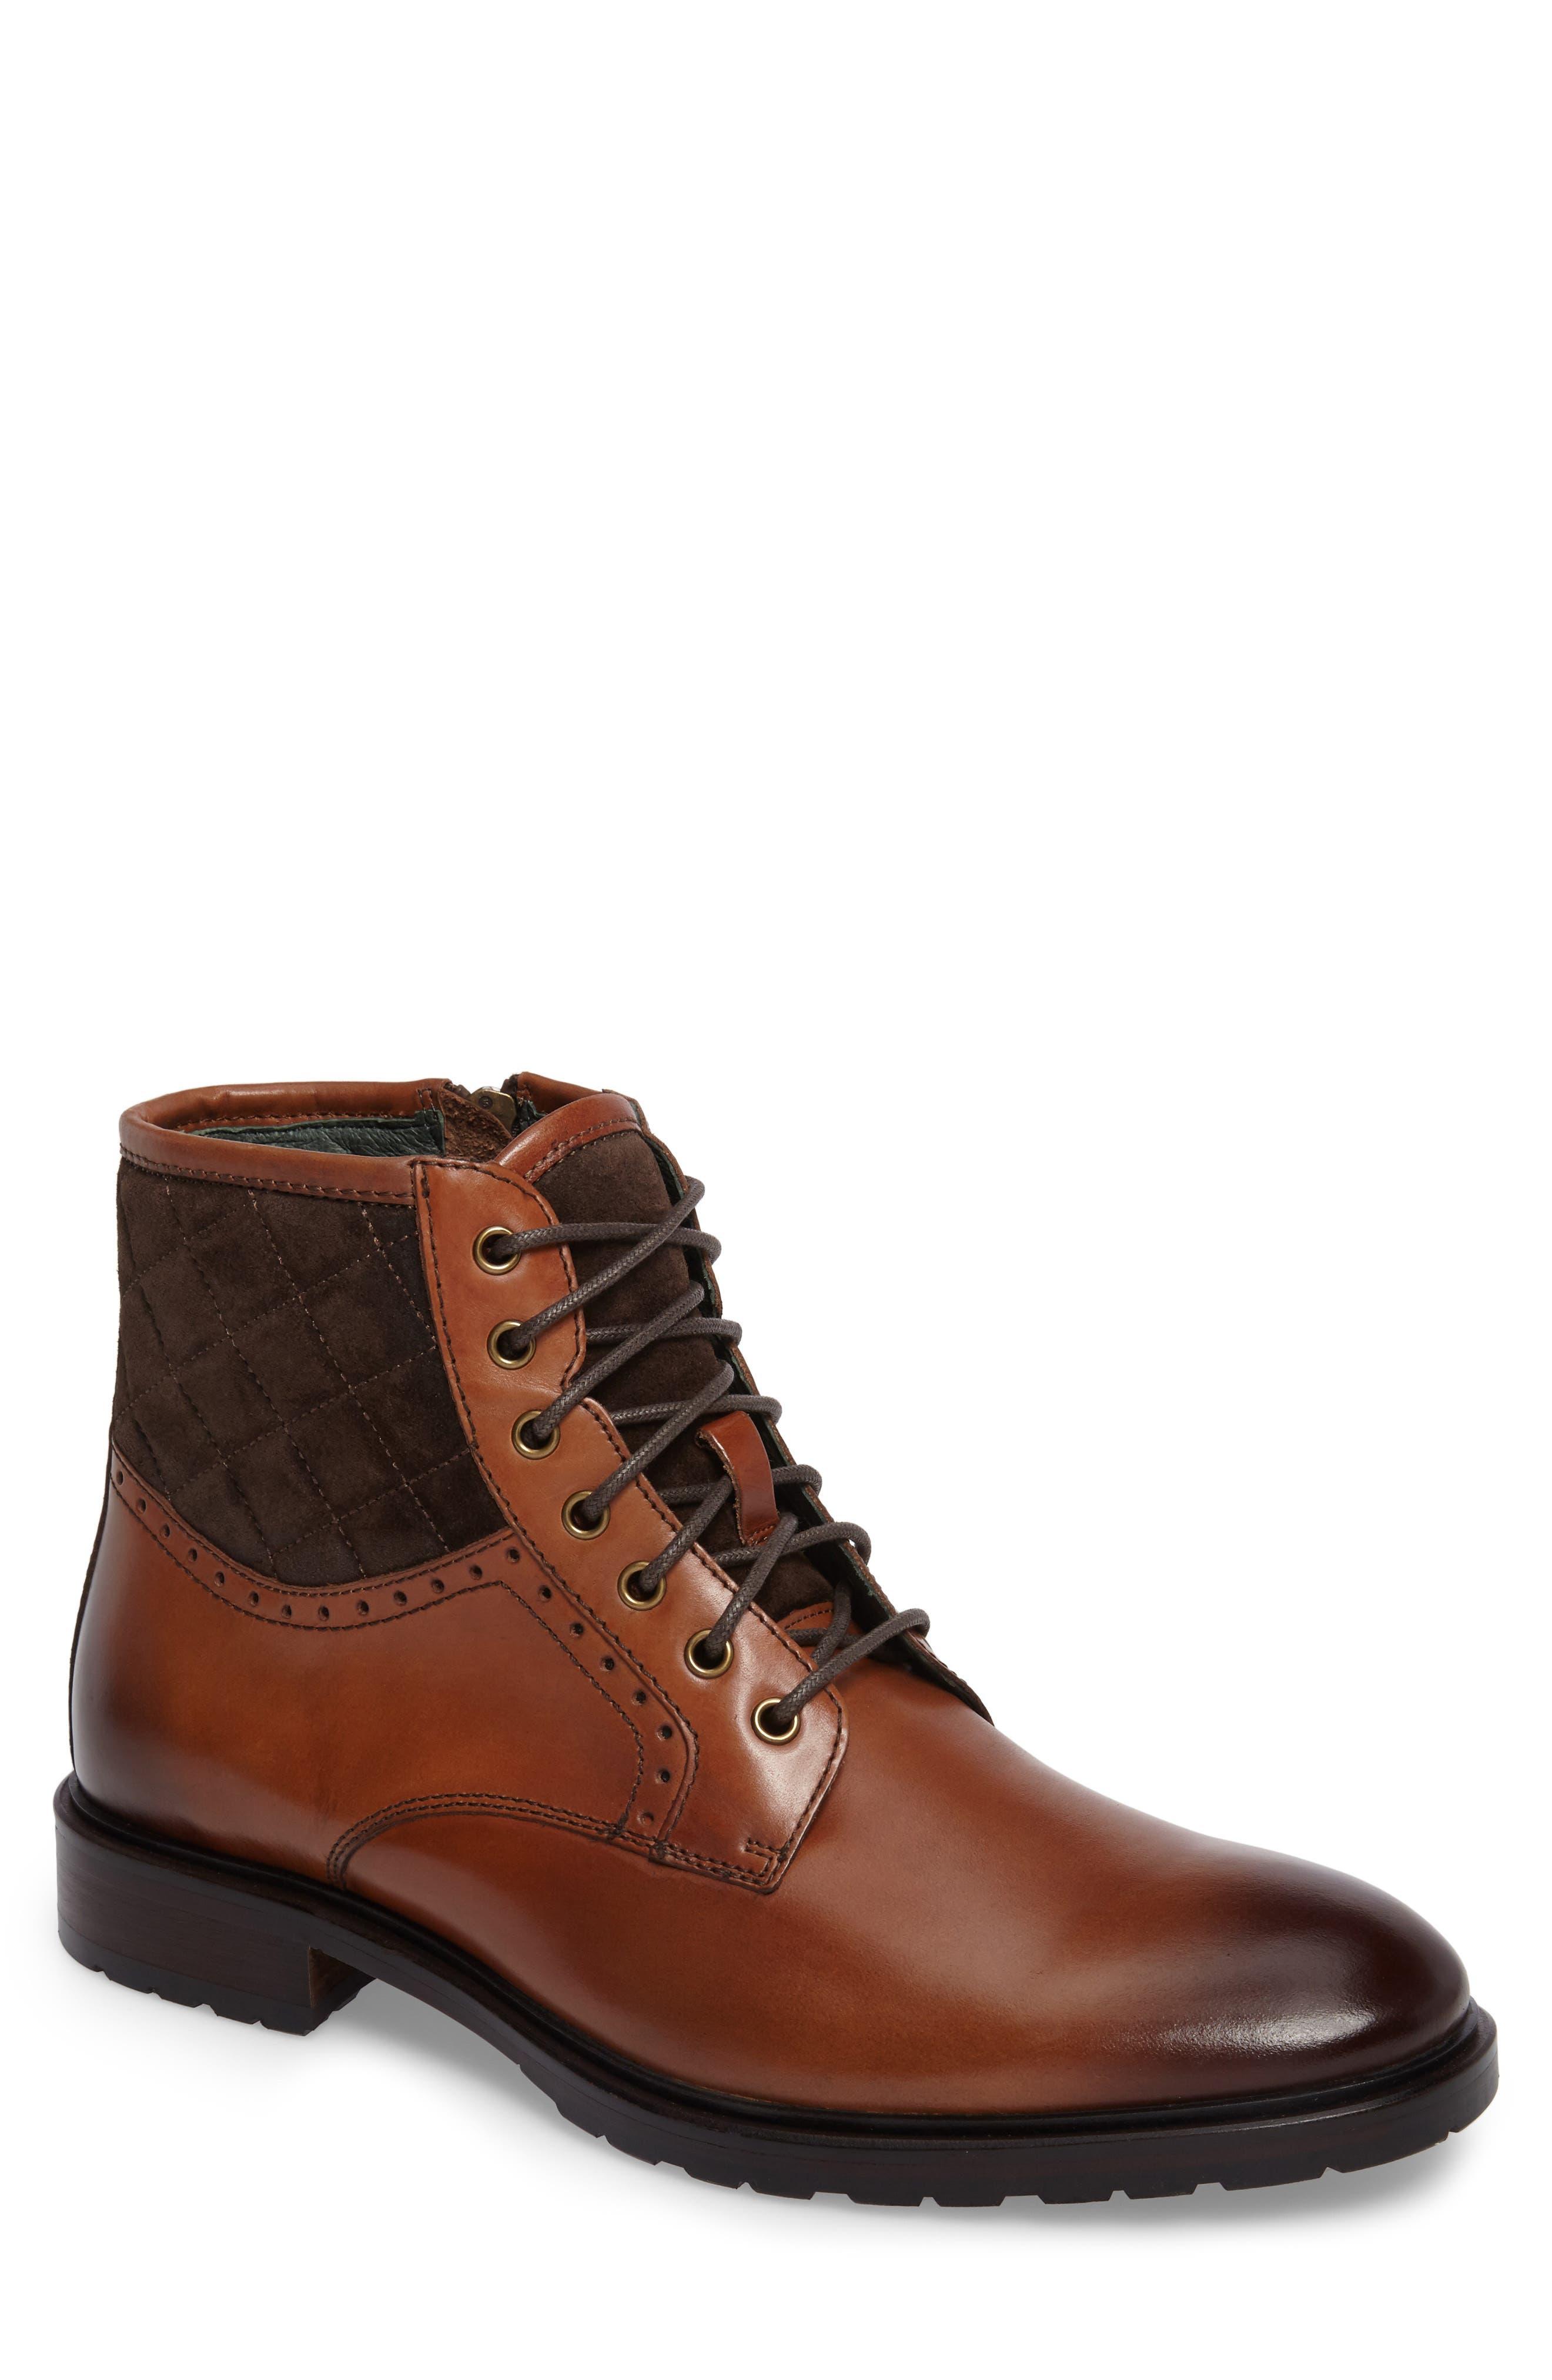 Alternate Image 1 Selected - J&M 1850 Myles Plain Toe Boot (Men)